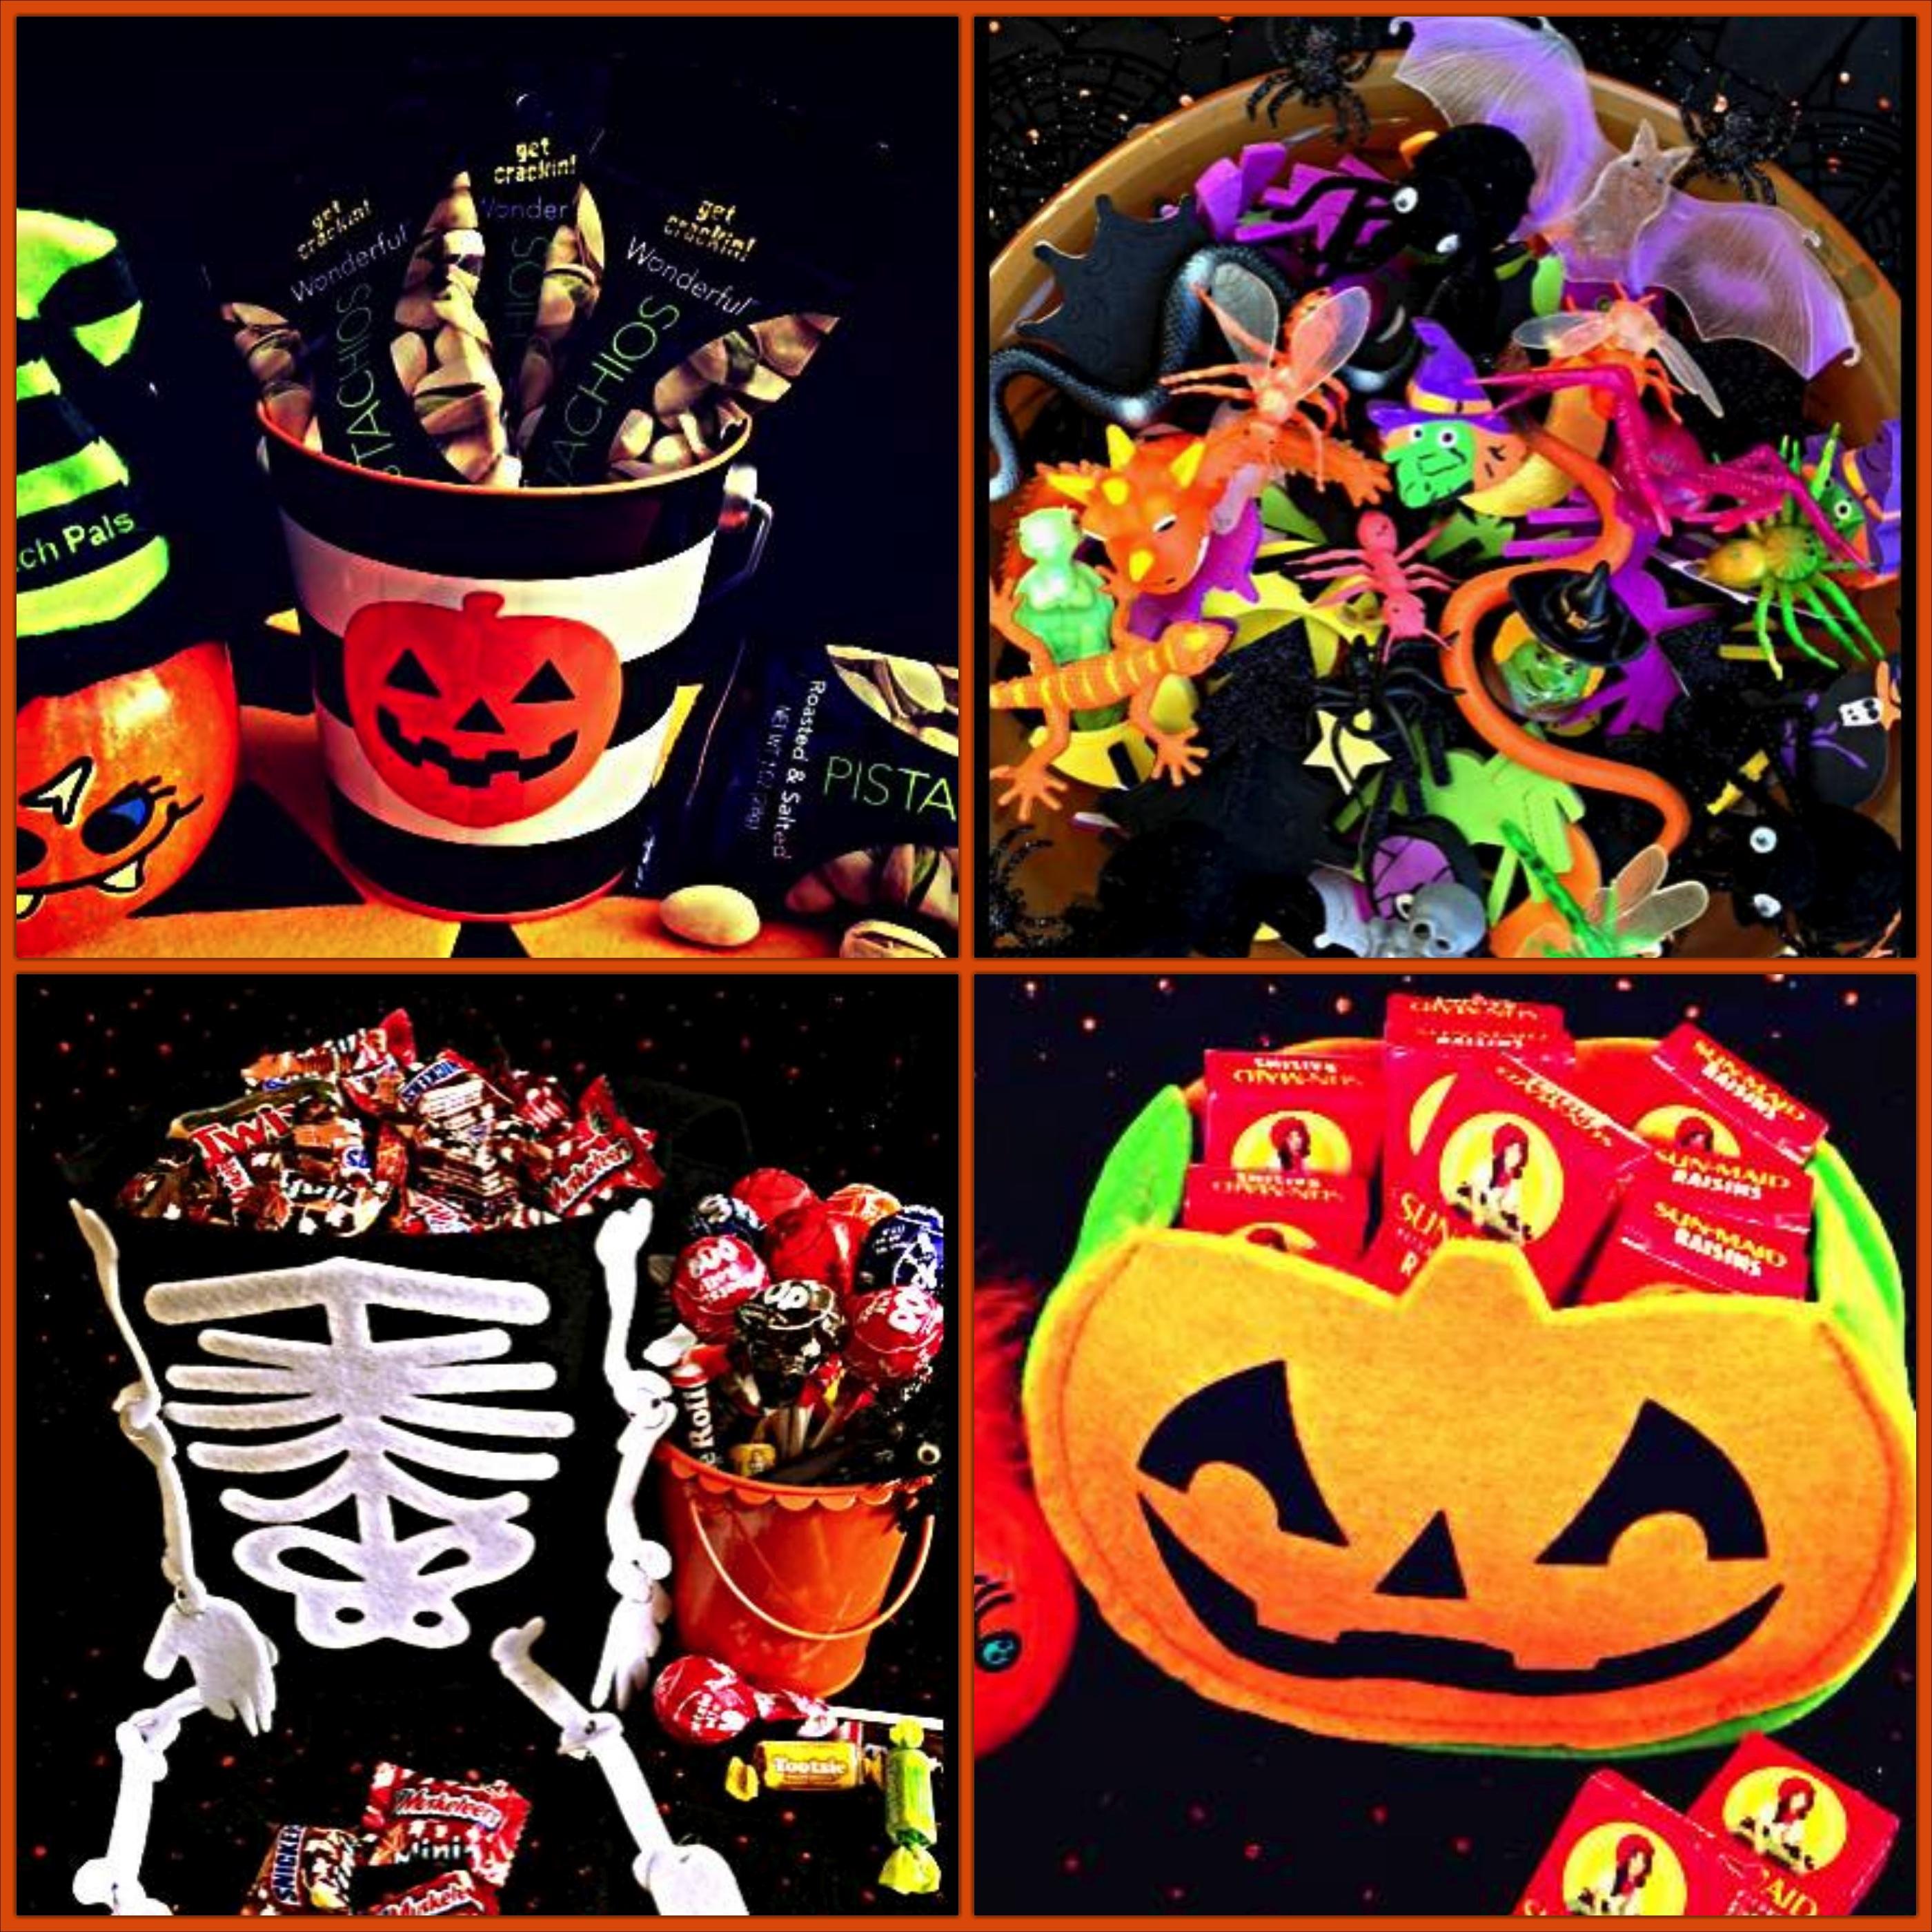 2013-10-05-Halloweencollage.jpg